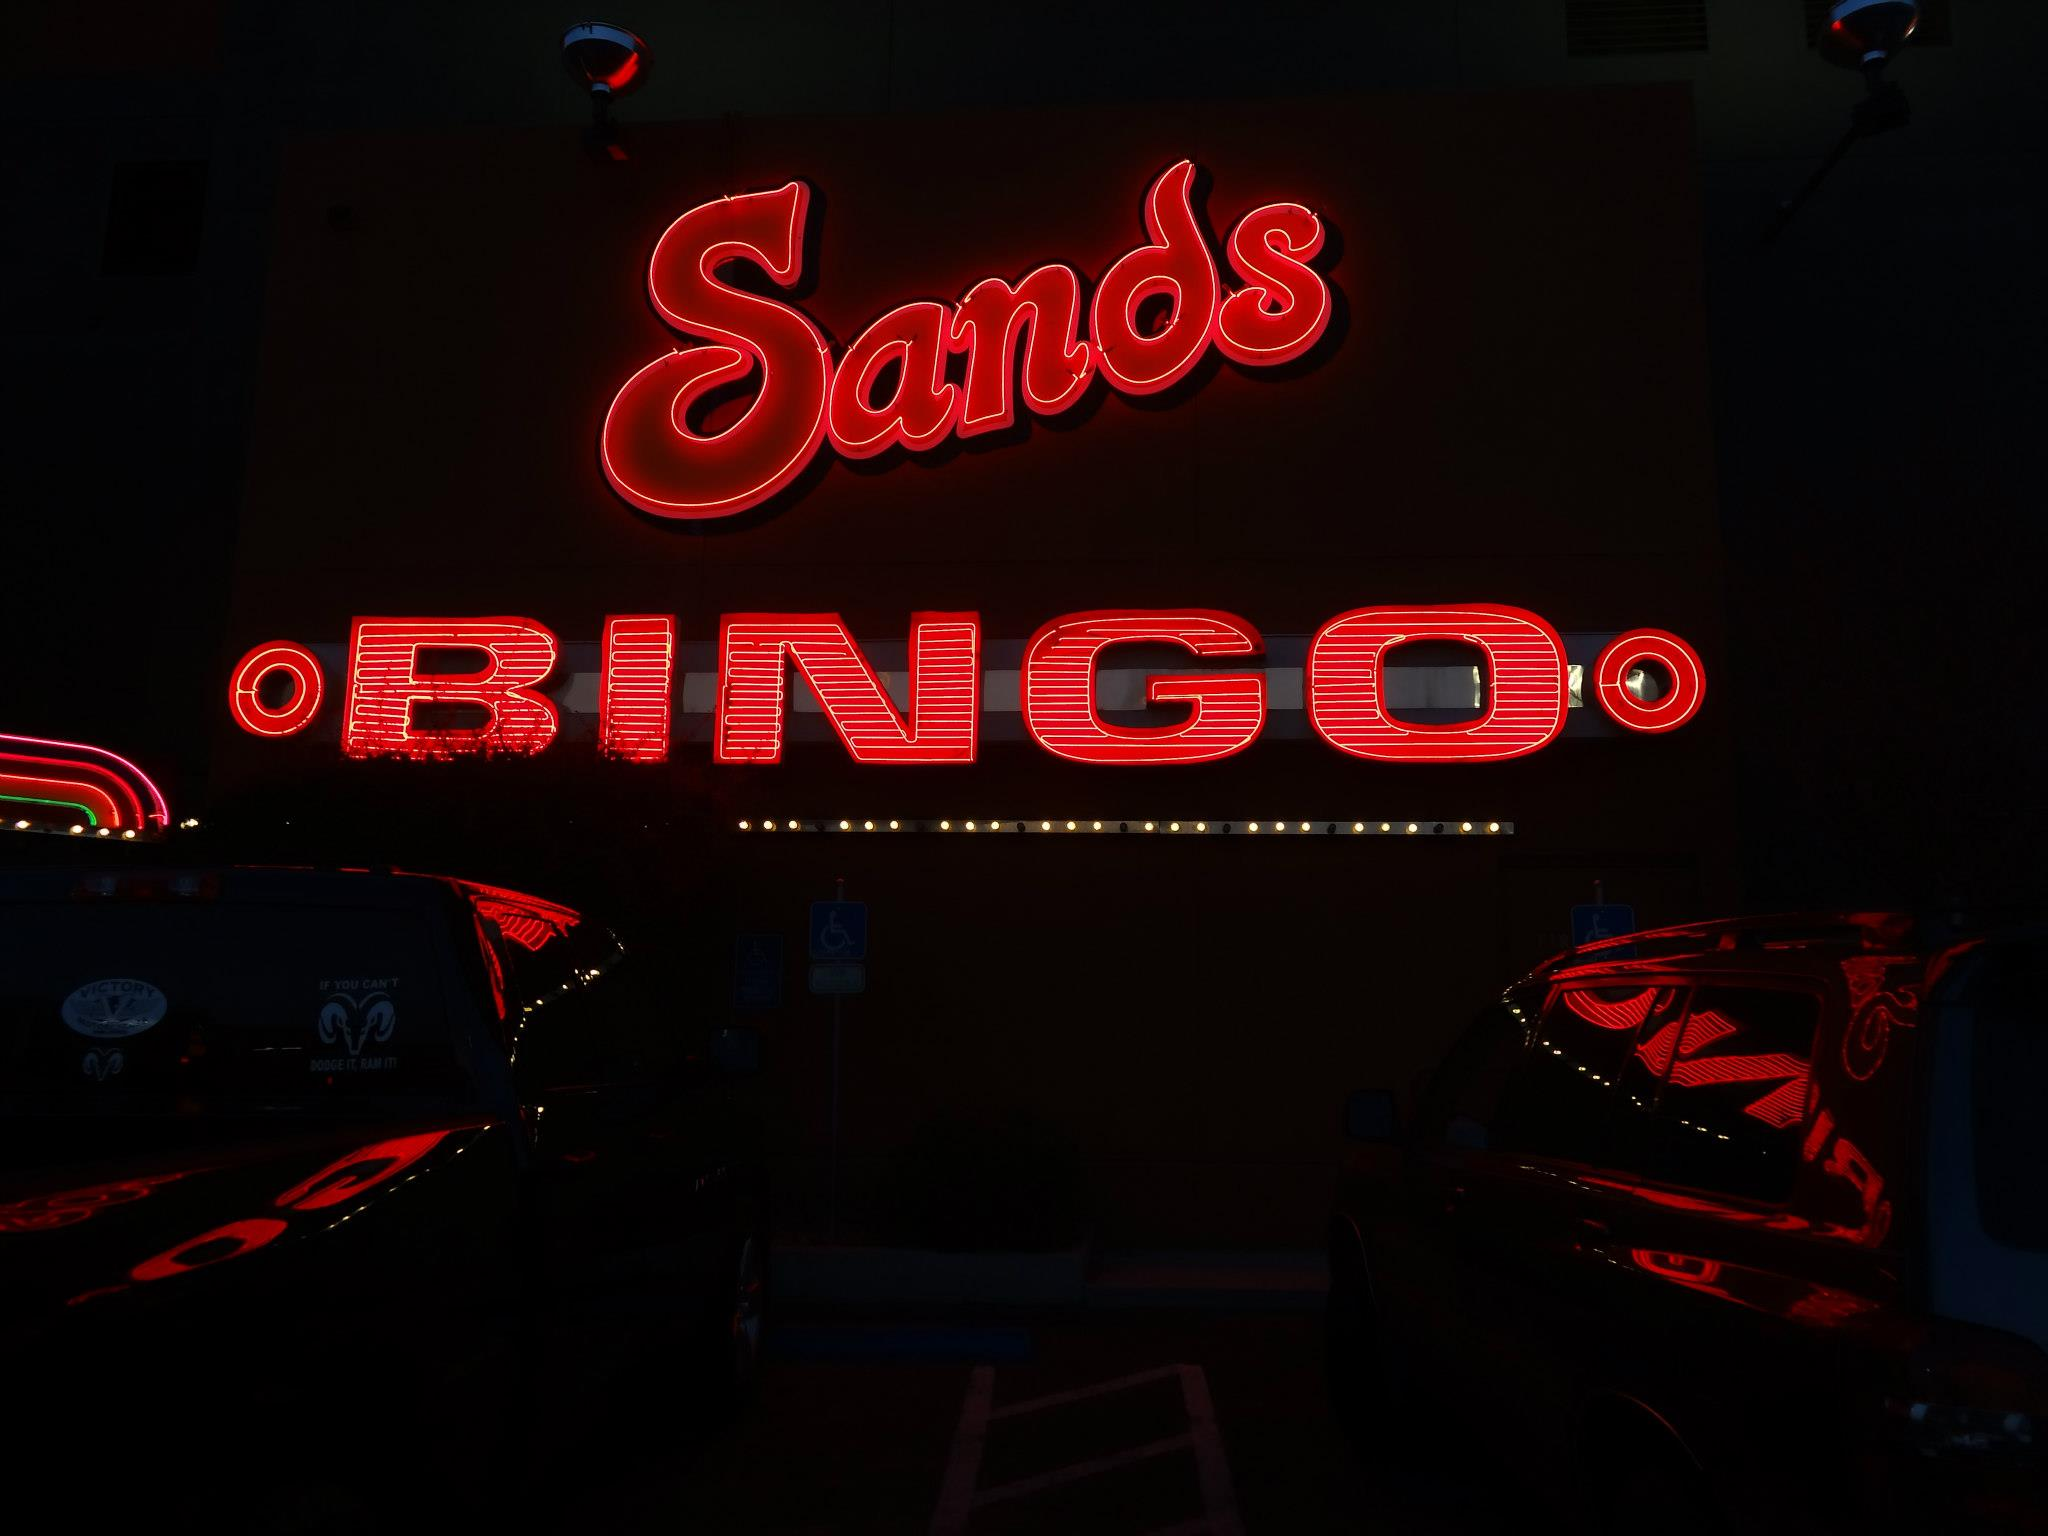 Sands casino neon sign